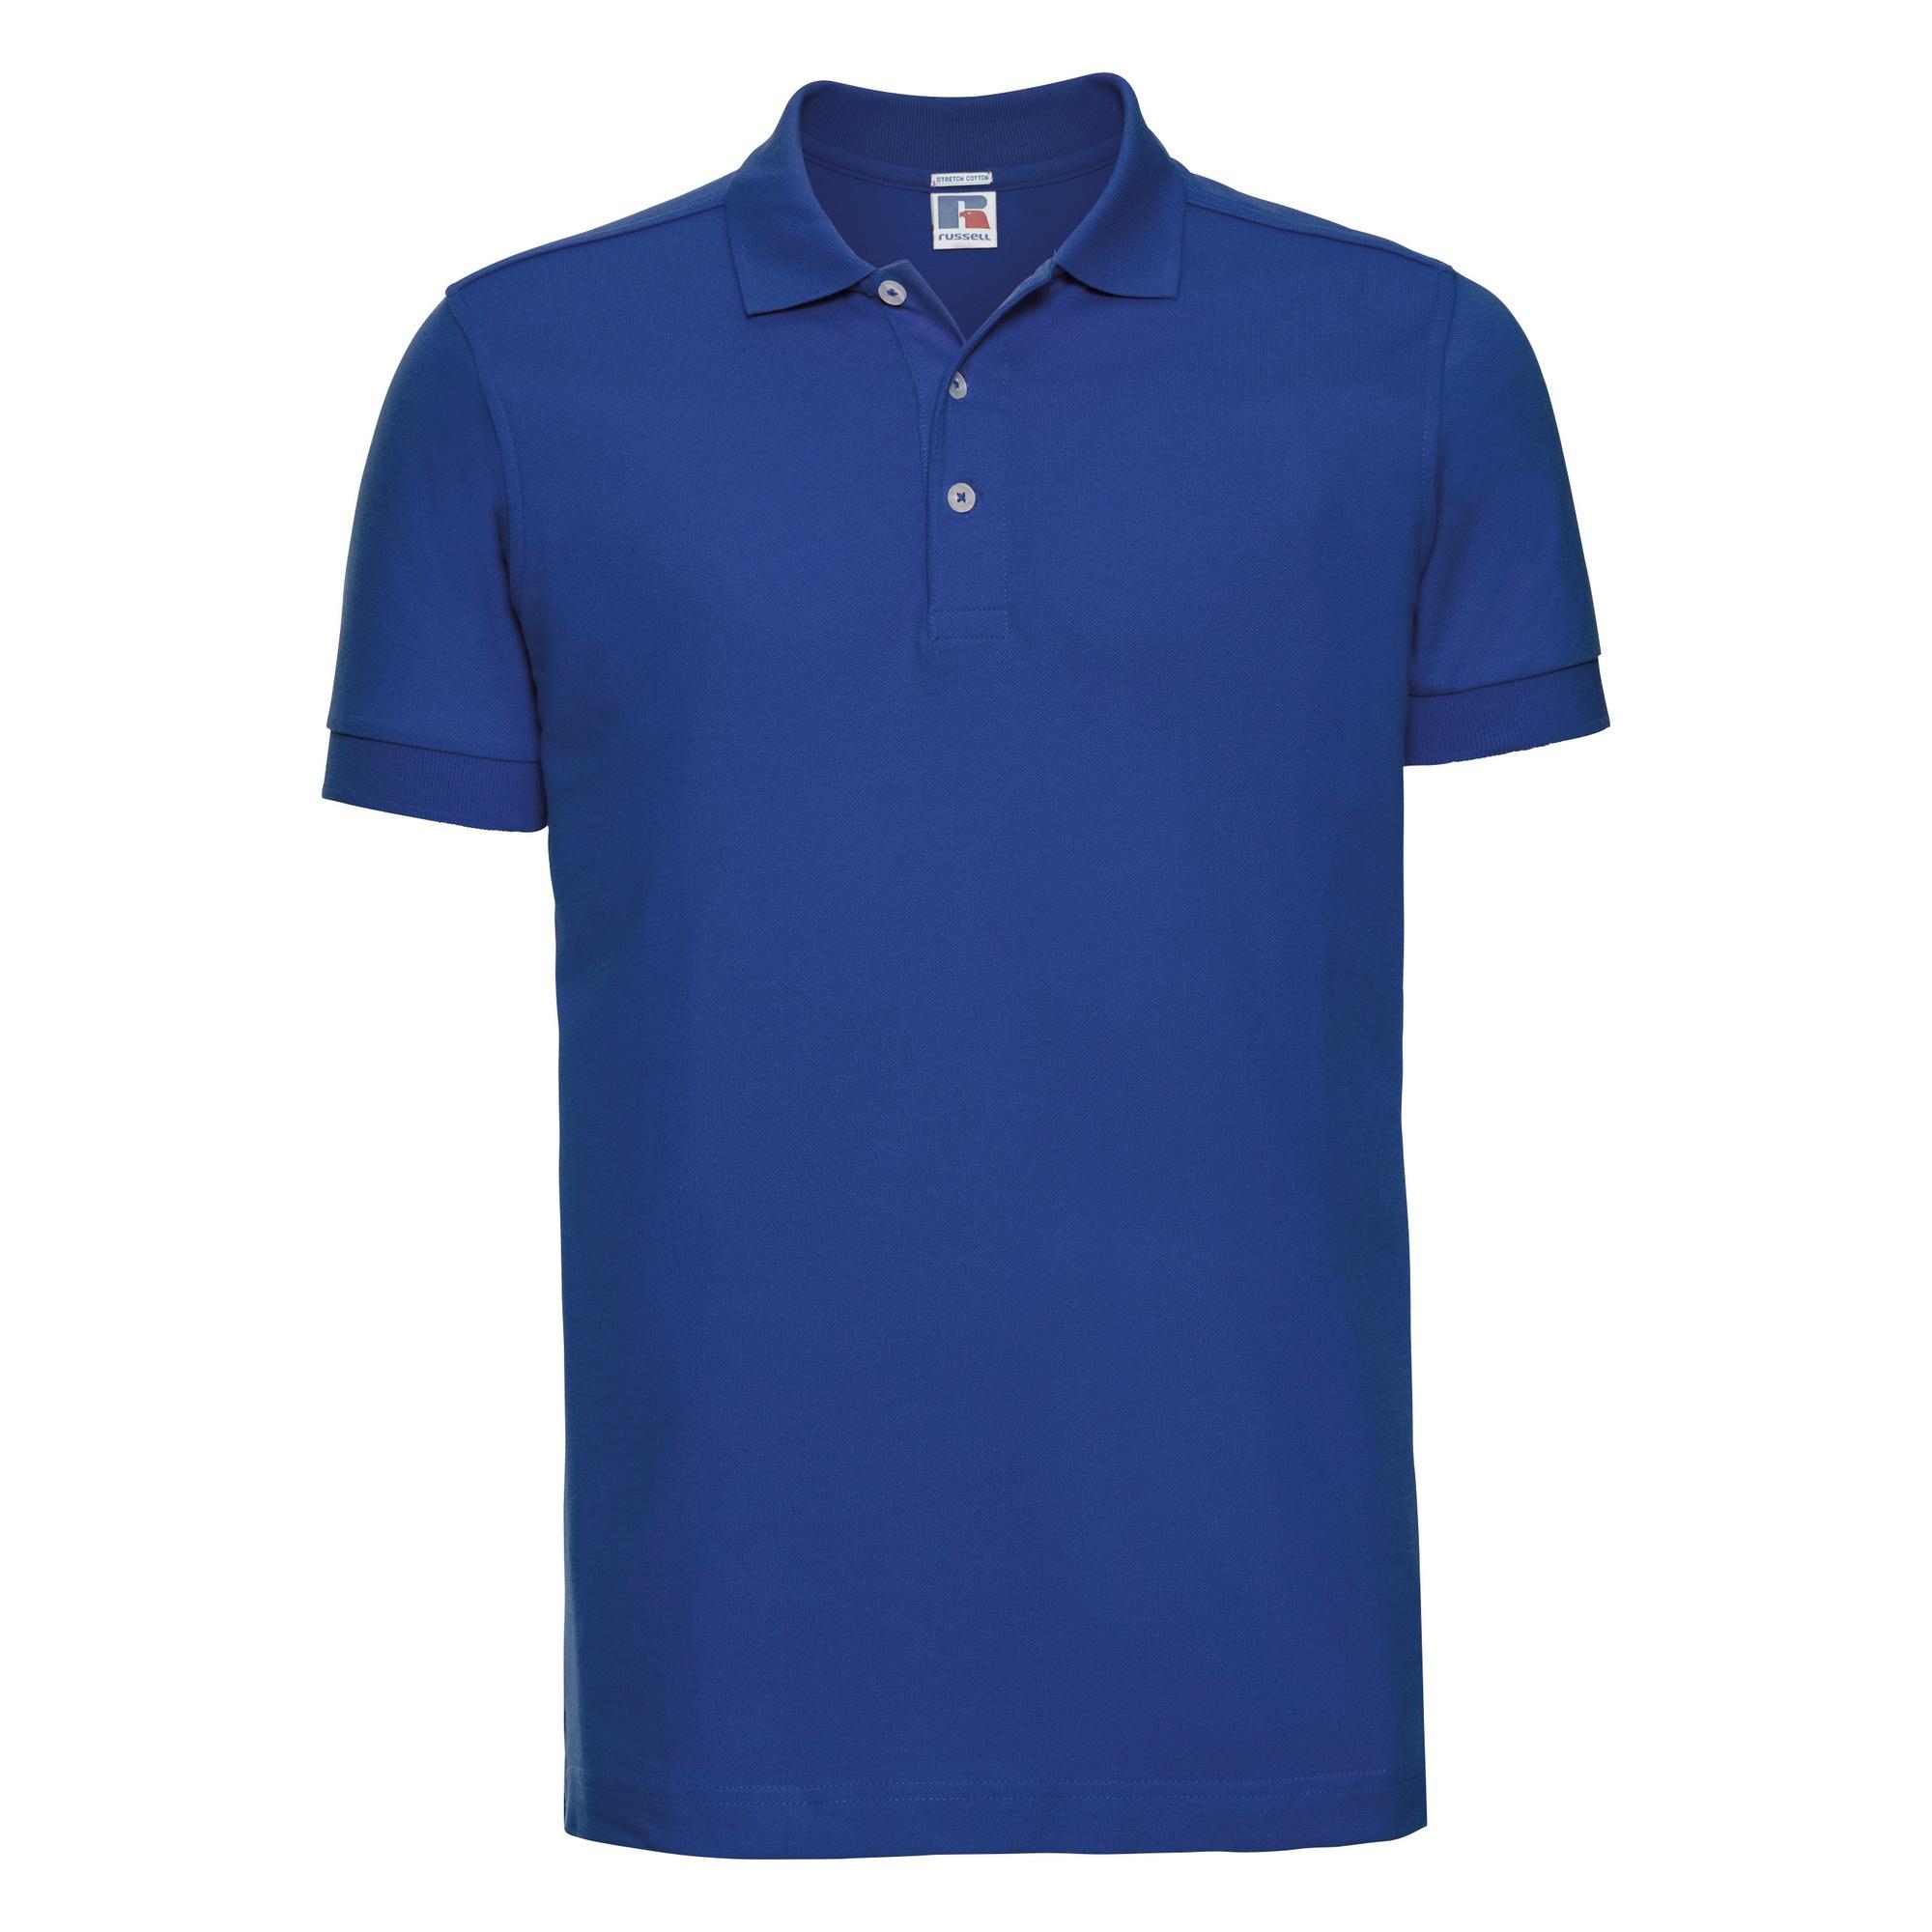 Russell Mens Stretch Short Sleeve Polo Shirt (3XL) (Bright Royal)